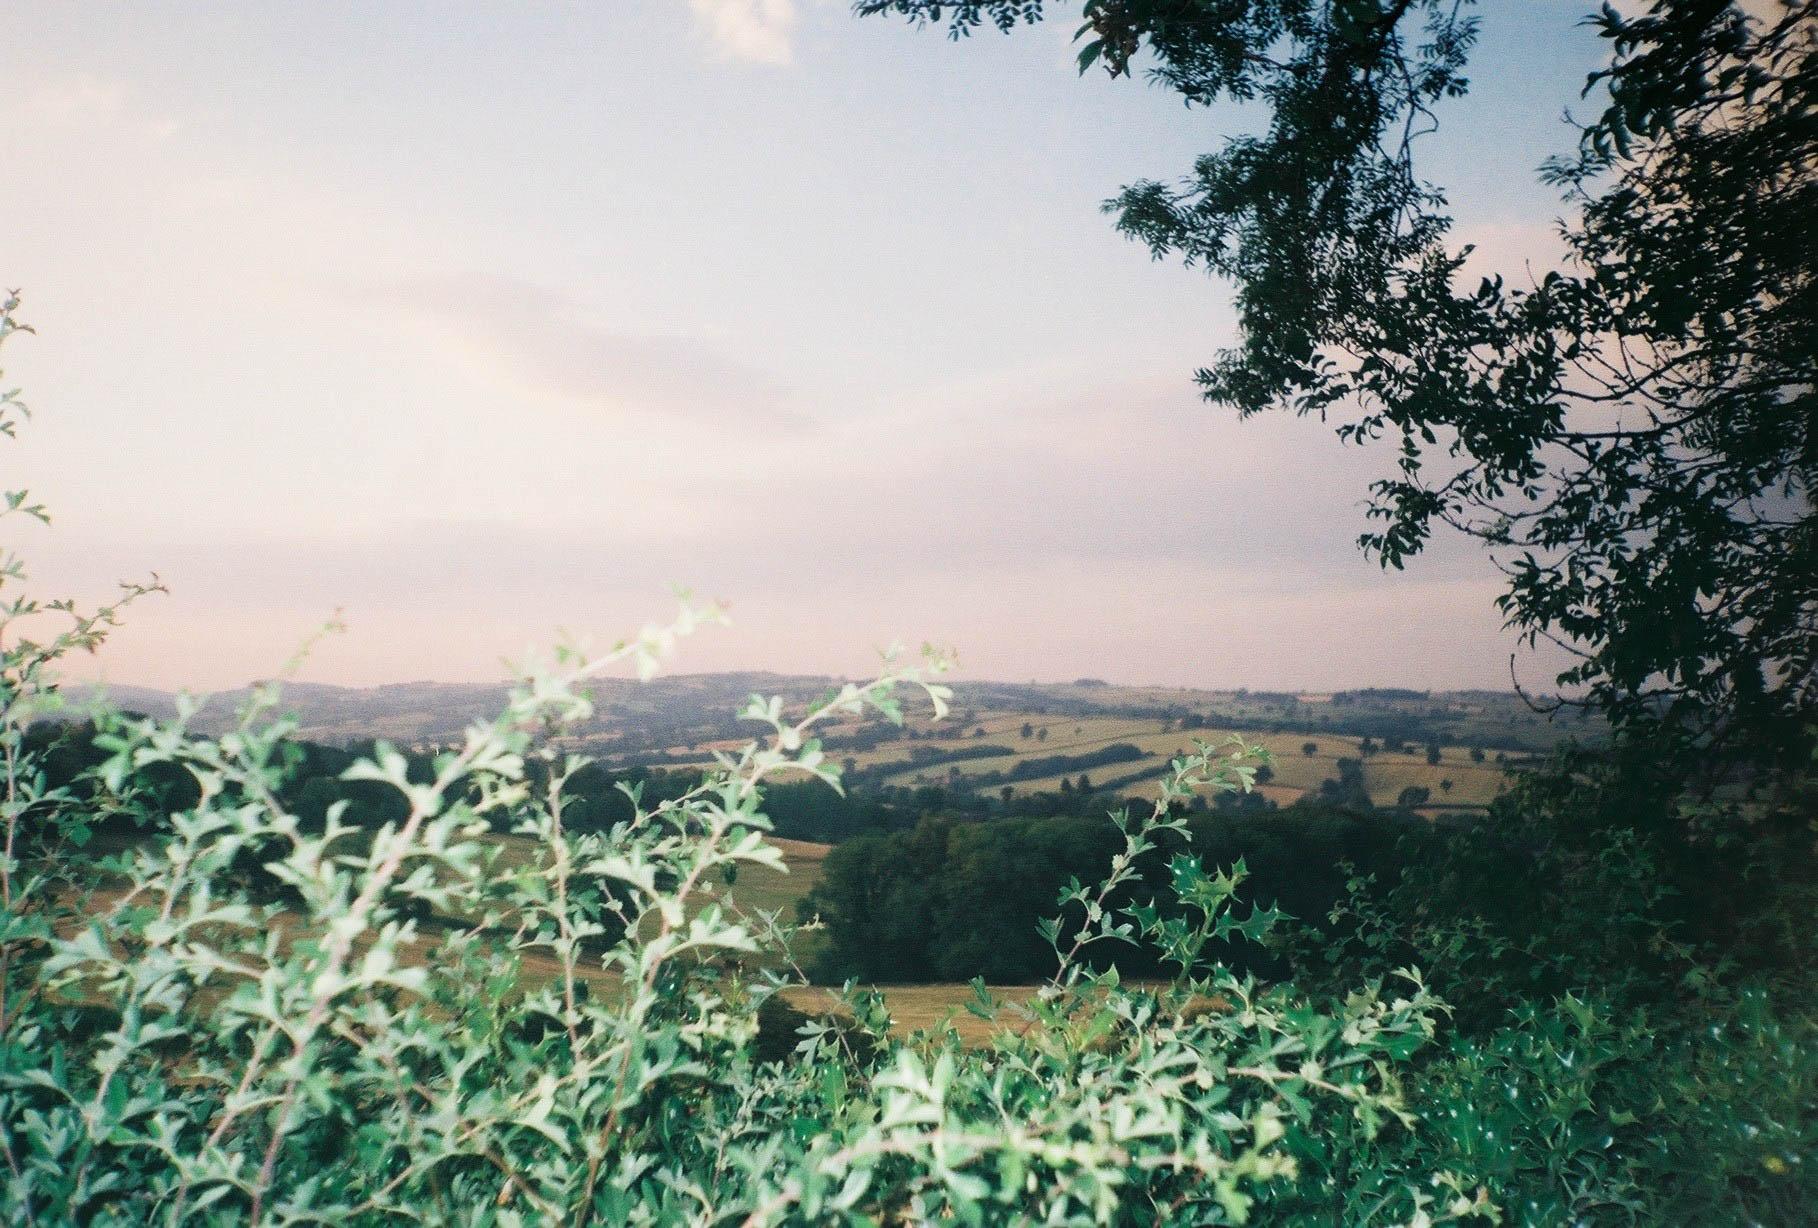 Countryside, Turnditch, Derbyshire, Amber Valley, East Midlands, Blogs, Photography, Film, 35mm, Olympus Trip MD3, Katie Writes, katiebwrites, KatieWritesBlog, KatieWritesUK, ©Katiewrites.co.uk